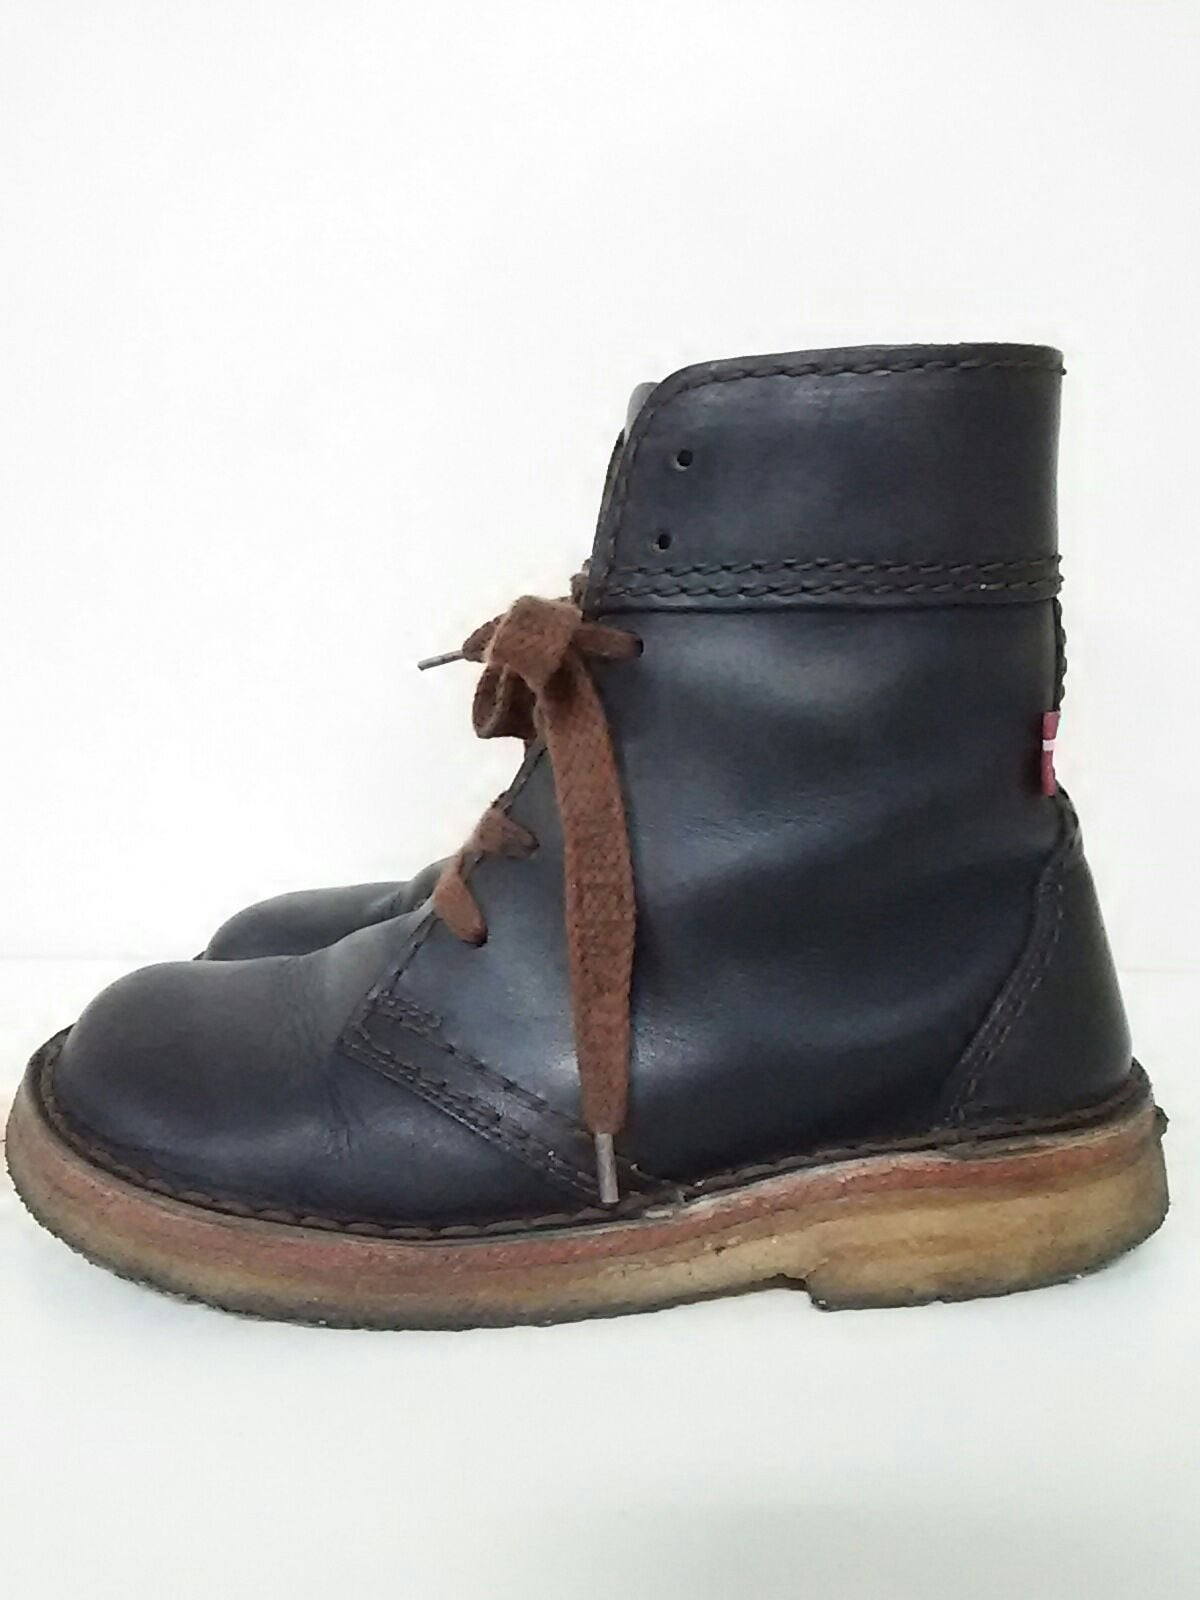 DANSKE ANDEFODDER(ダンスク)のブーツ